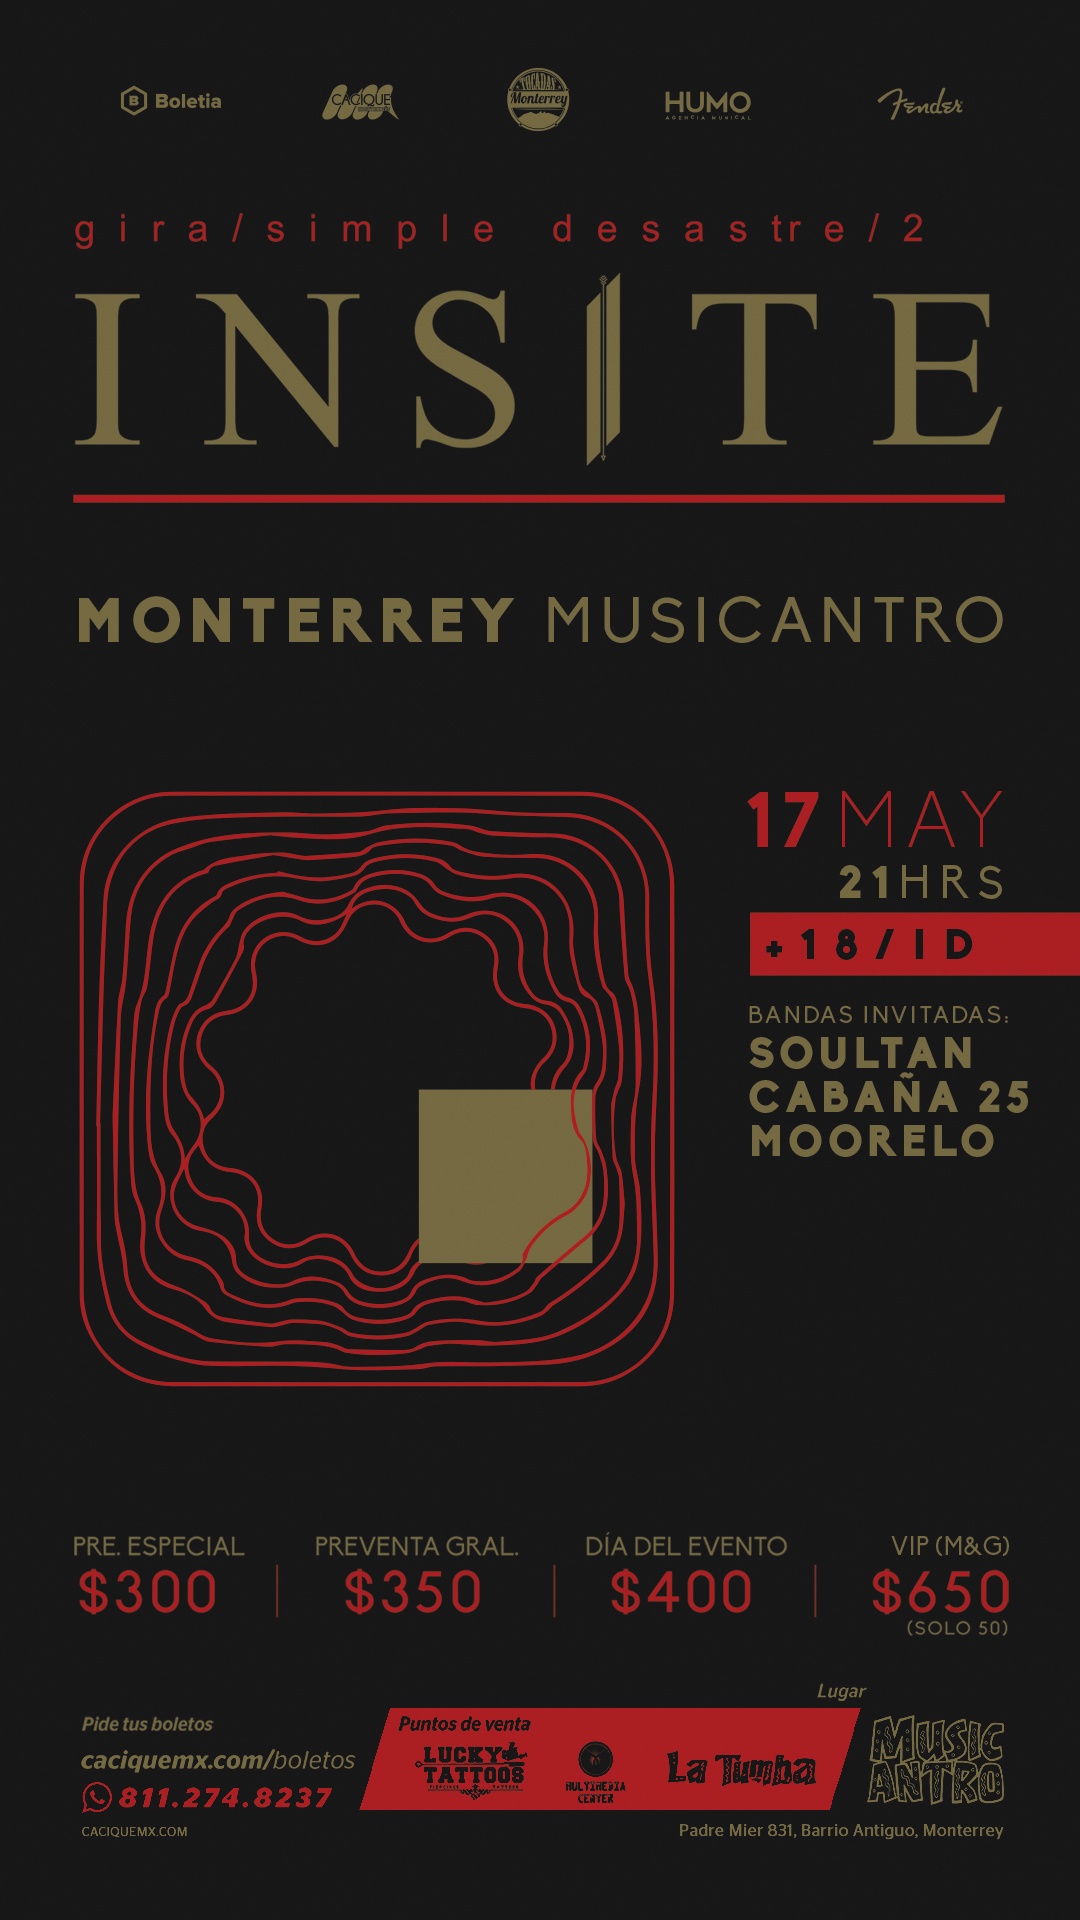 2019.05.17 Insite (Monterrey) Instagram Story.jpg